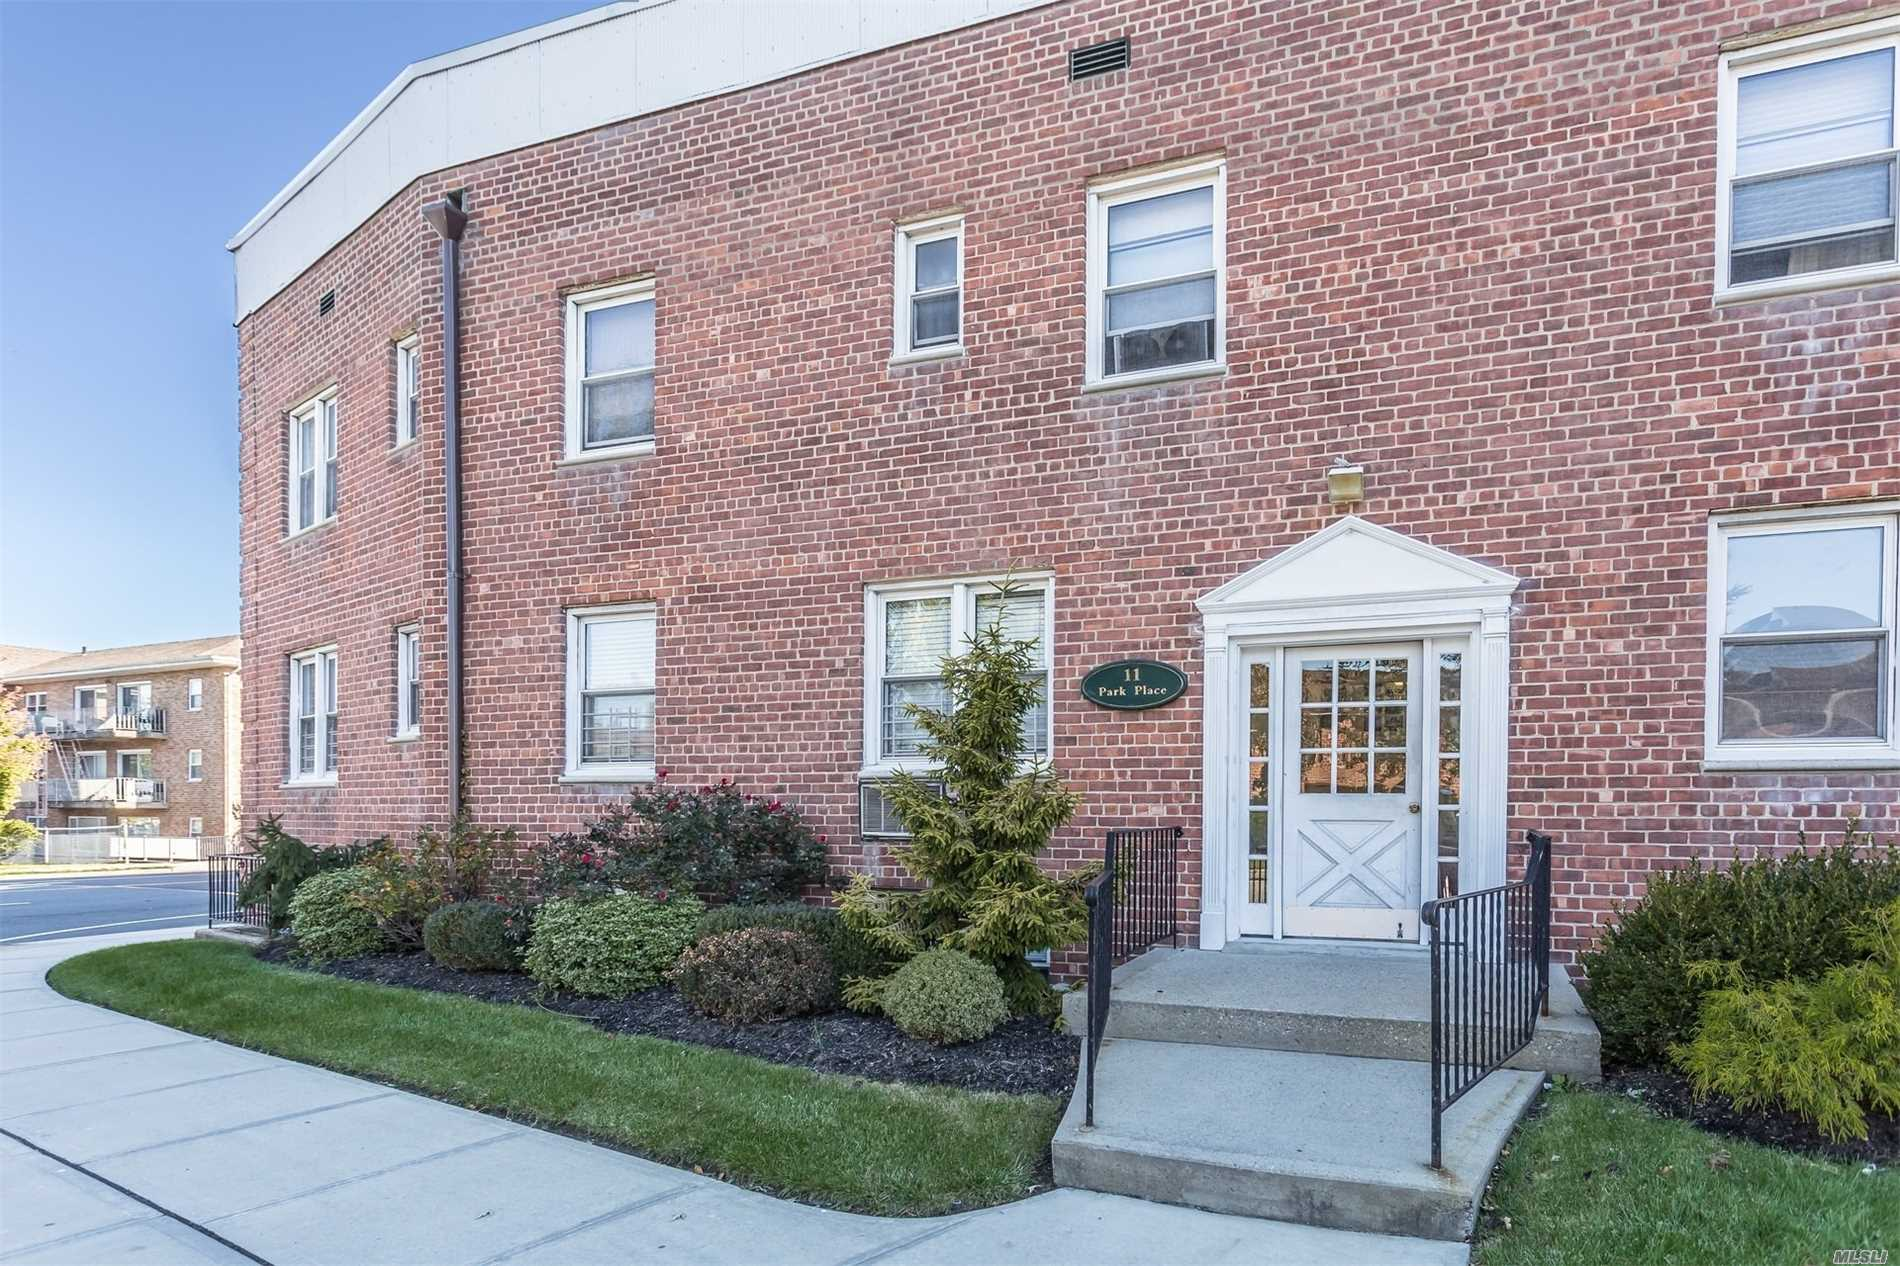 Property for sale at 11 Park Pl, Rockville Centre,  NY 11570